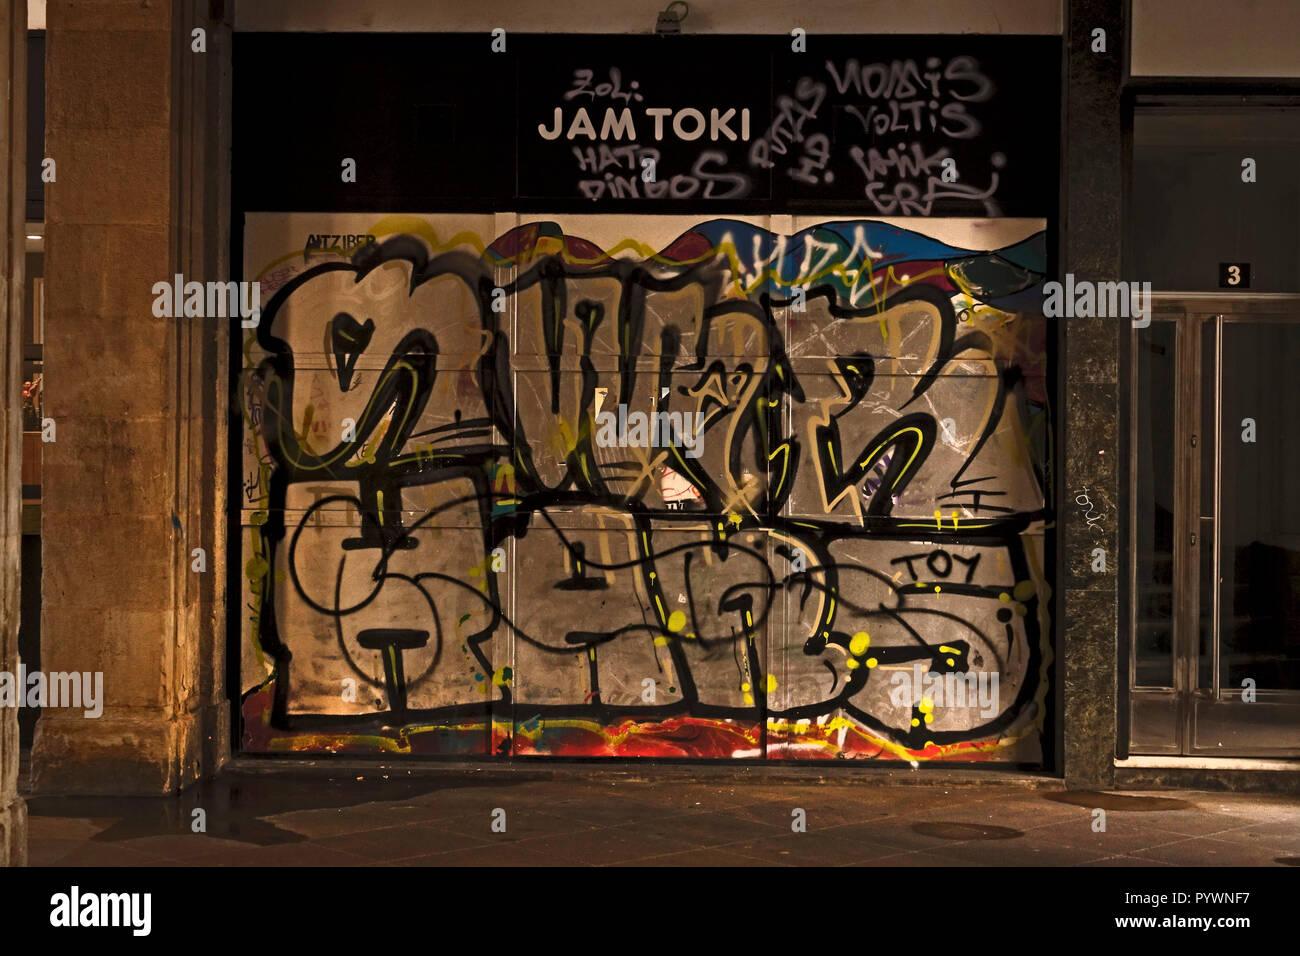 Bilbao City, Basque Region, Spain Grafitti scrawled on doorway in Old Town - Stock Image